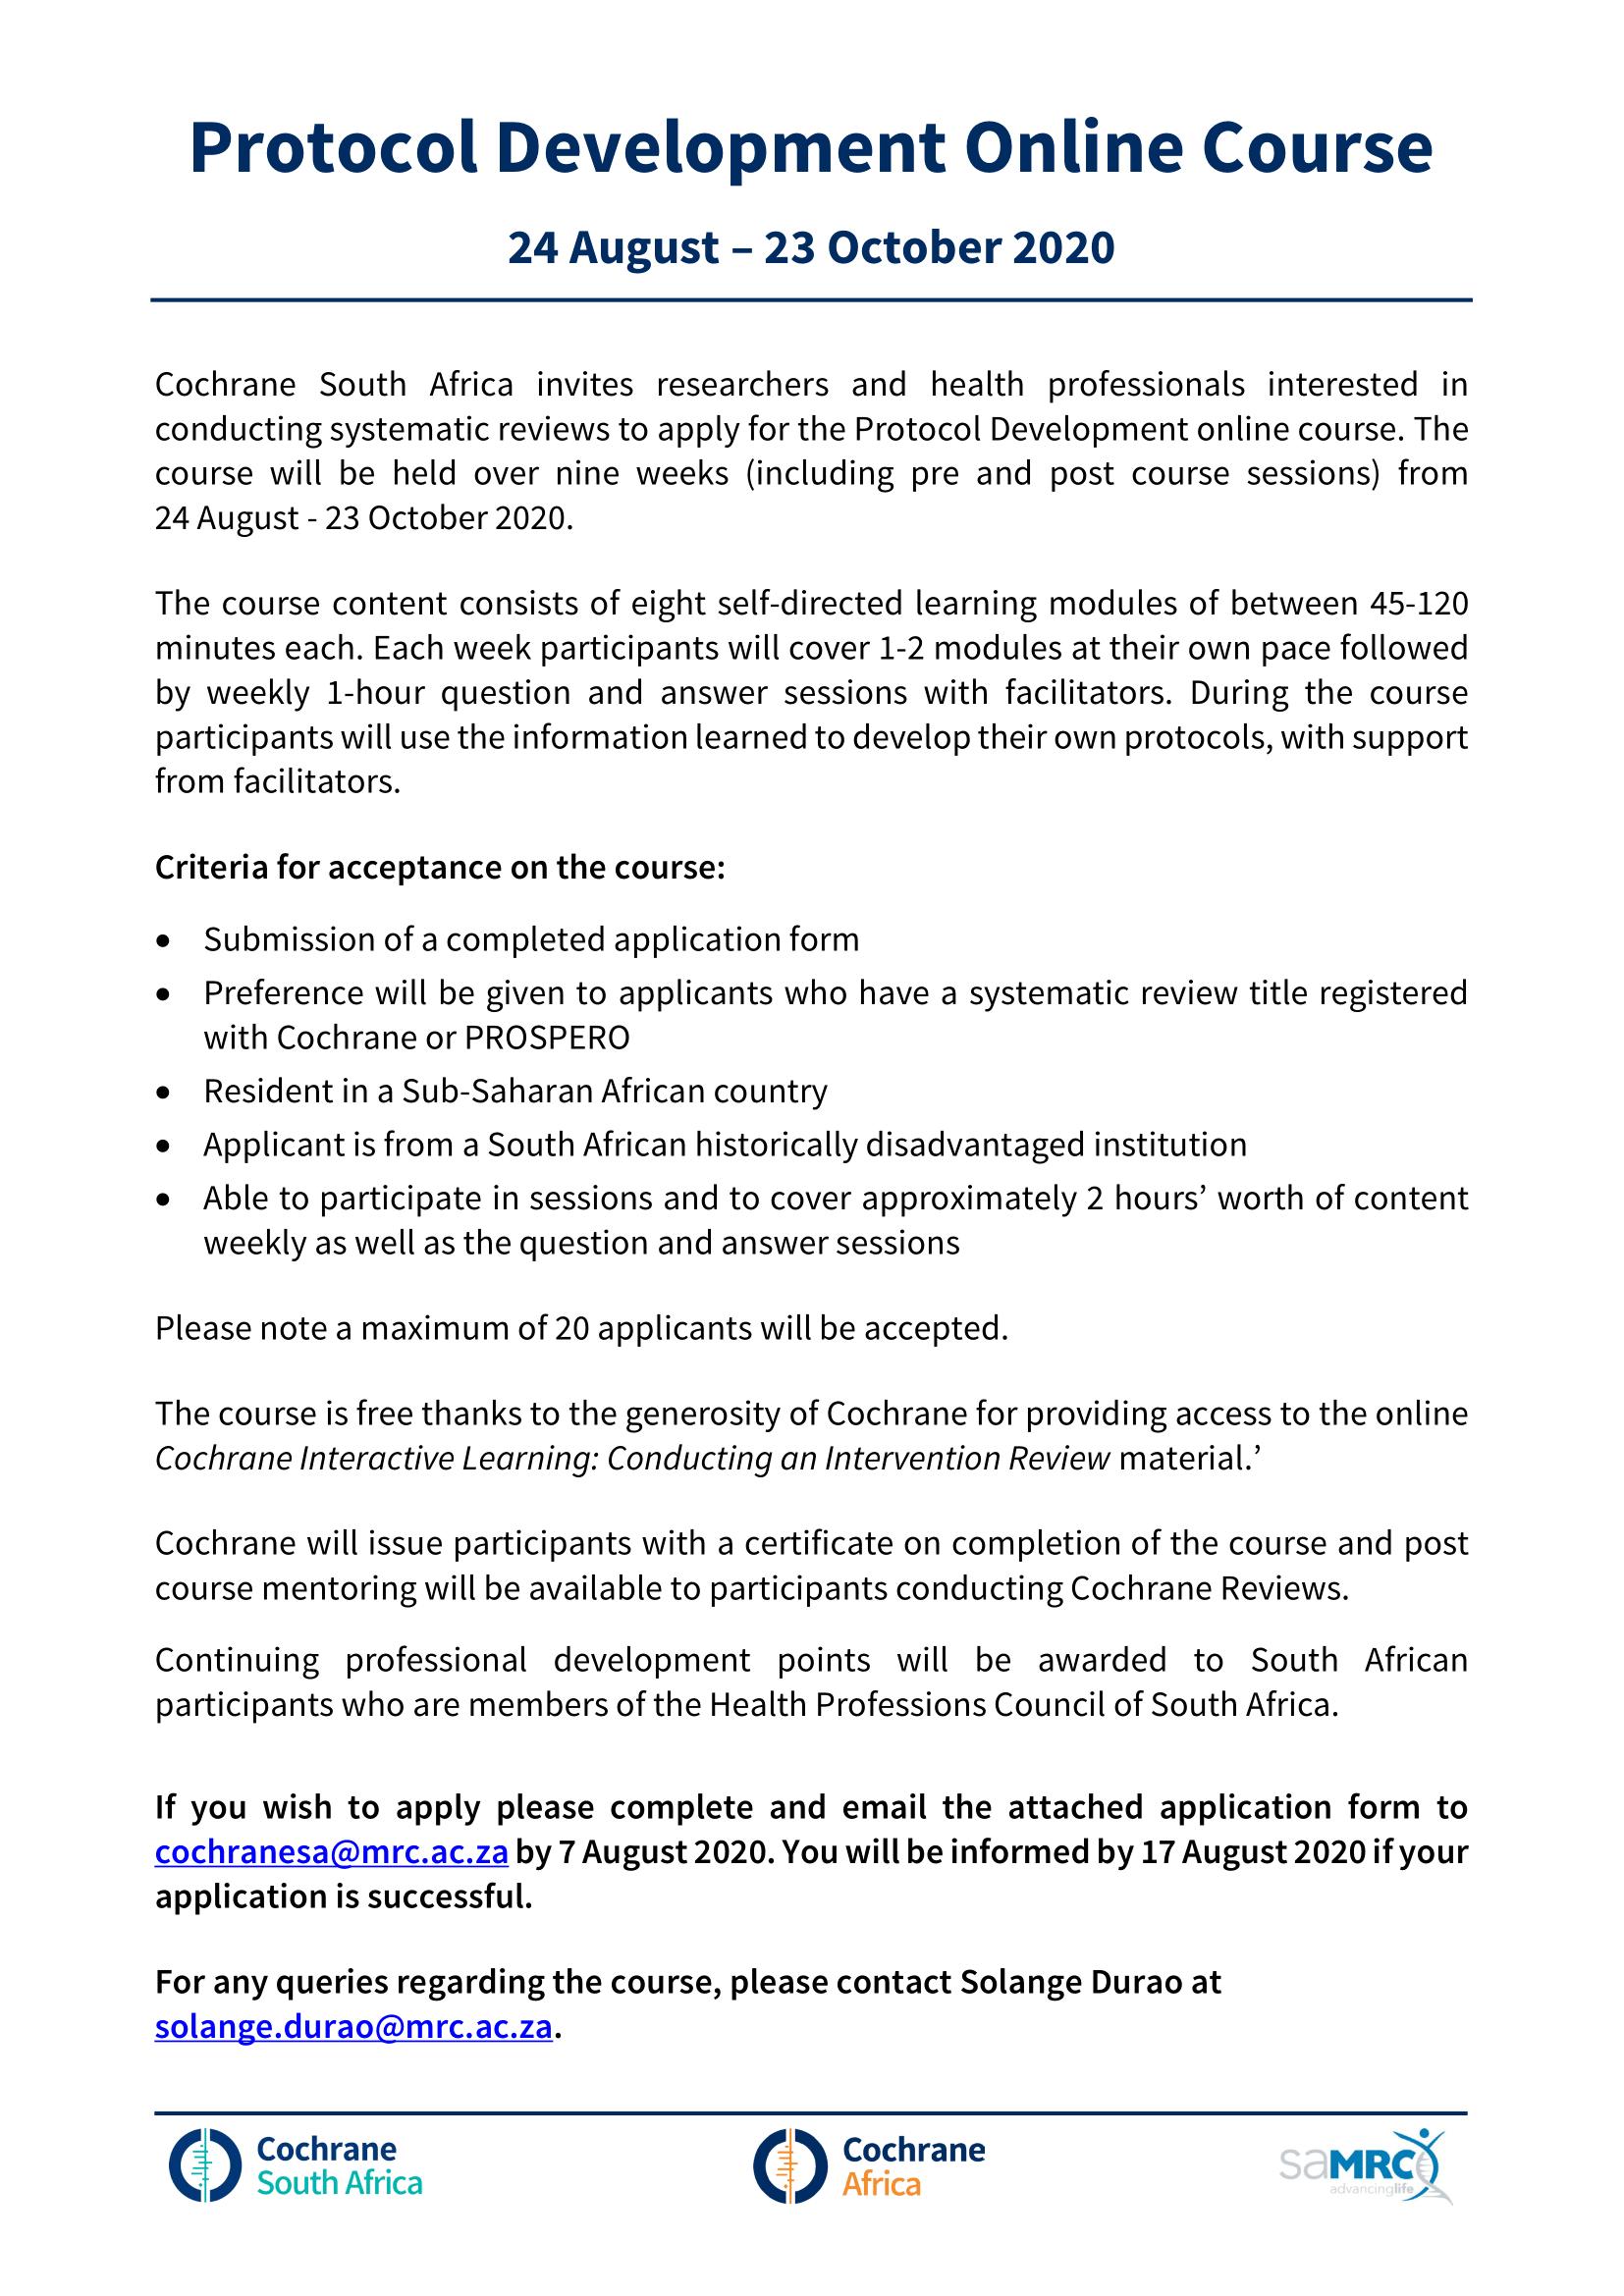 Protocol development online course